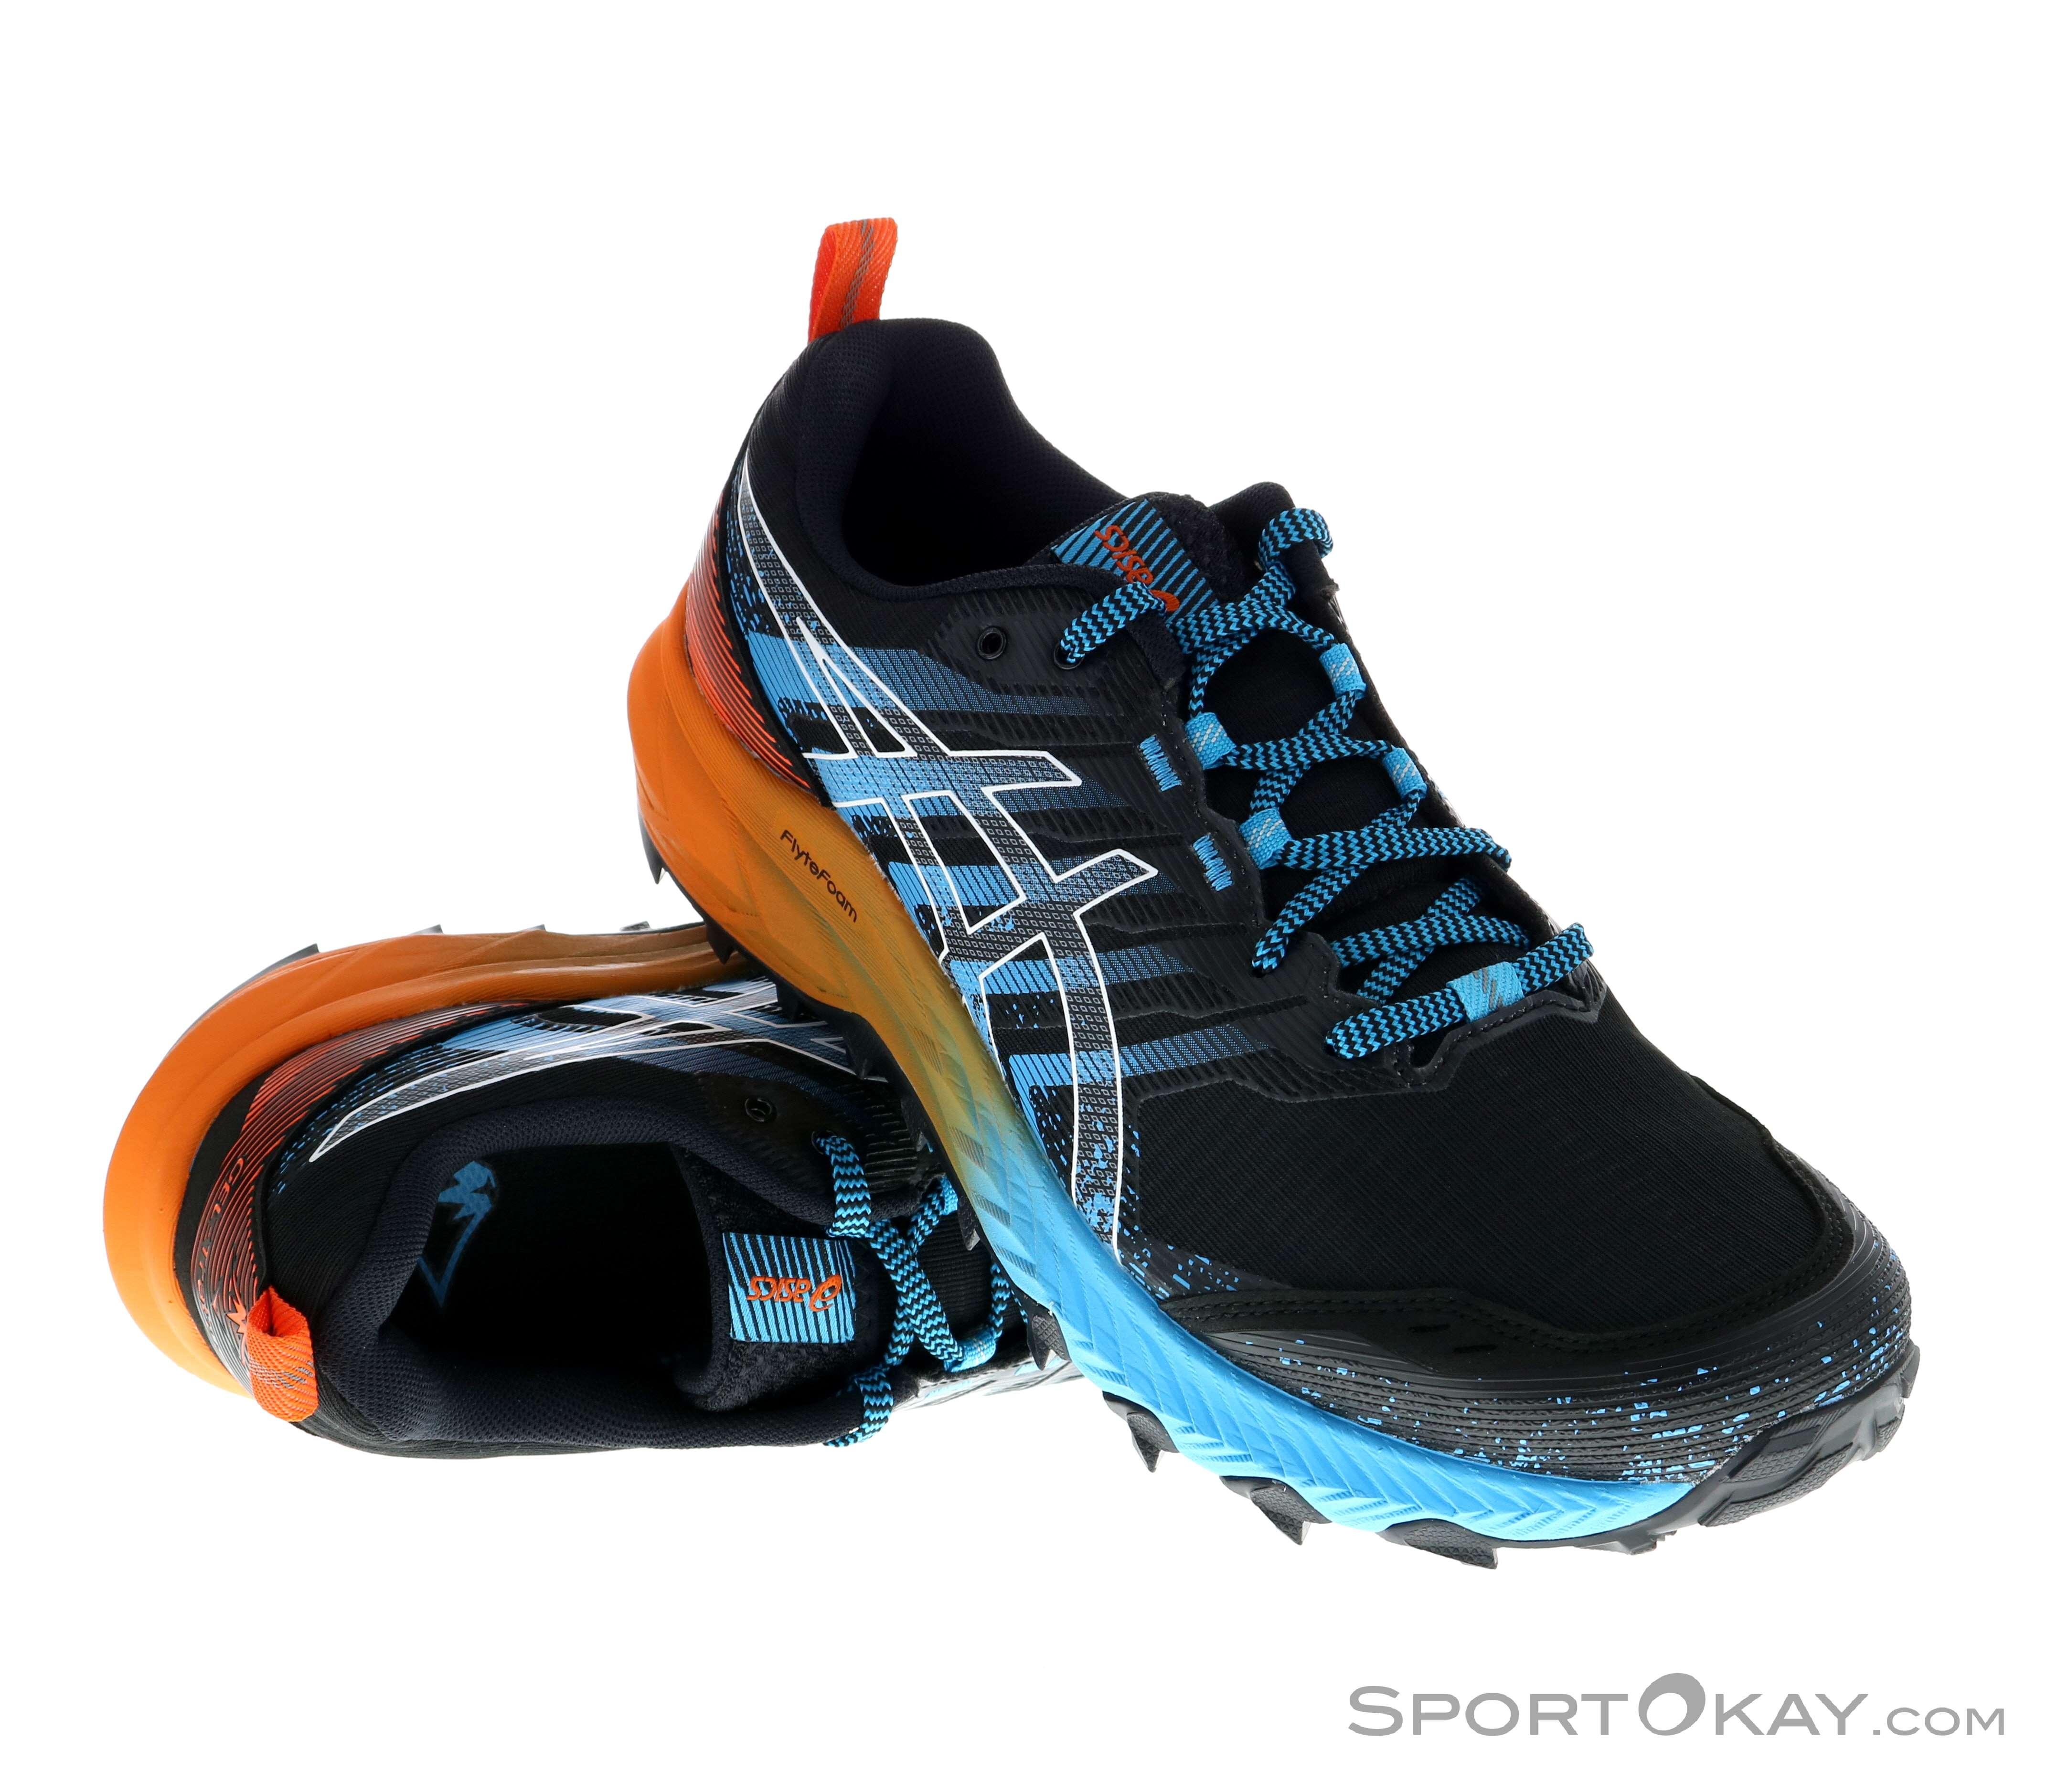 Asics Asics Fujitrabuco 9 Mens Trailrunningshoes